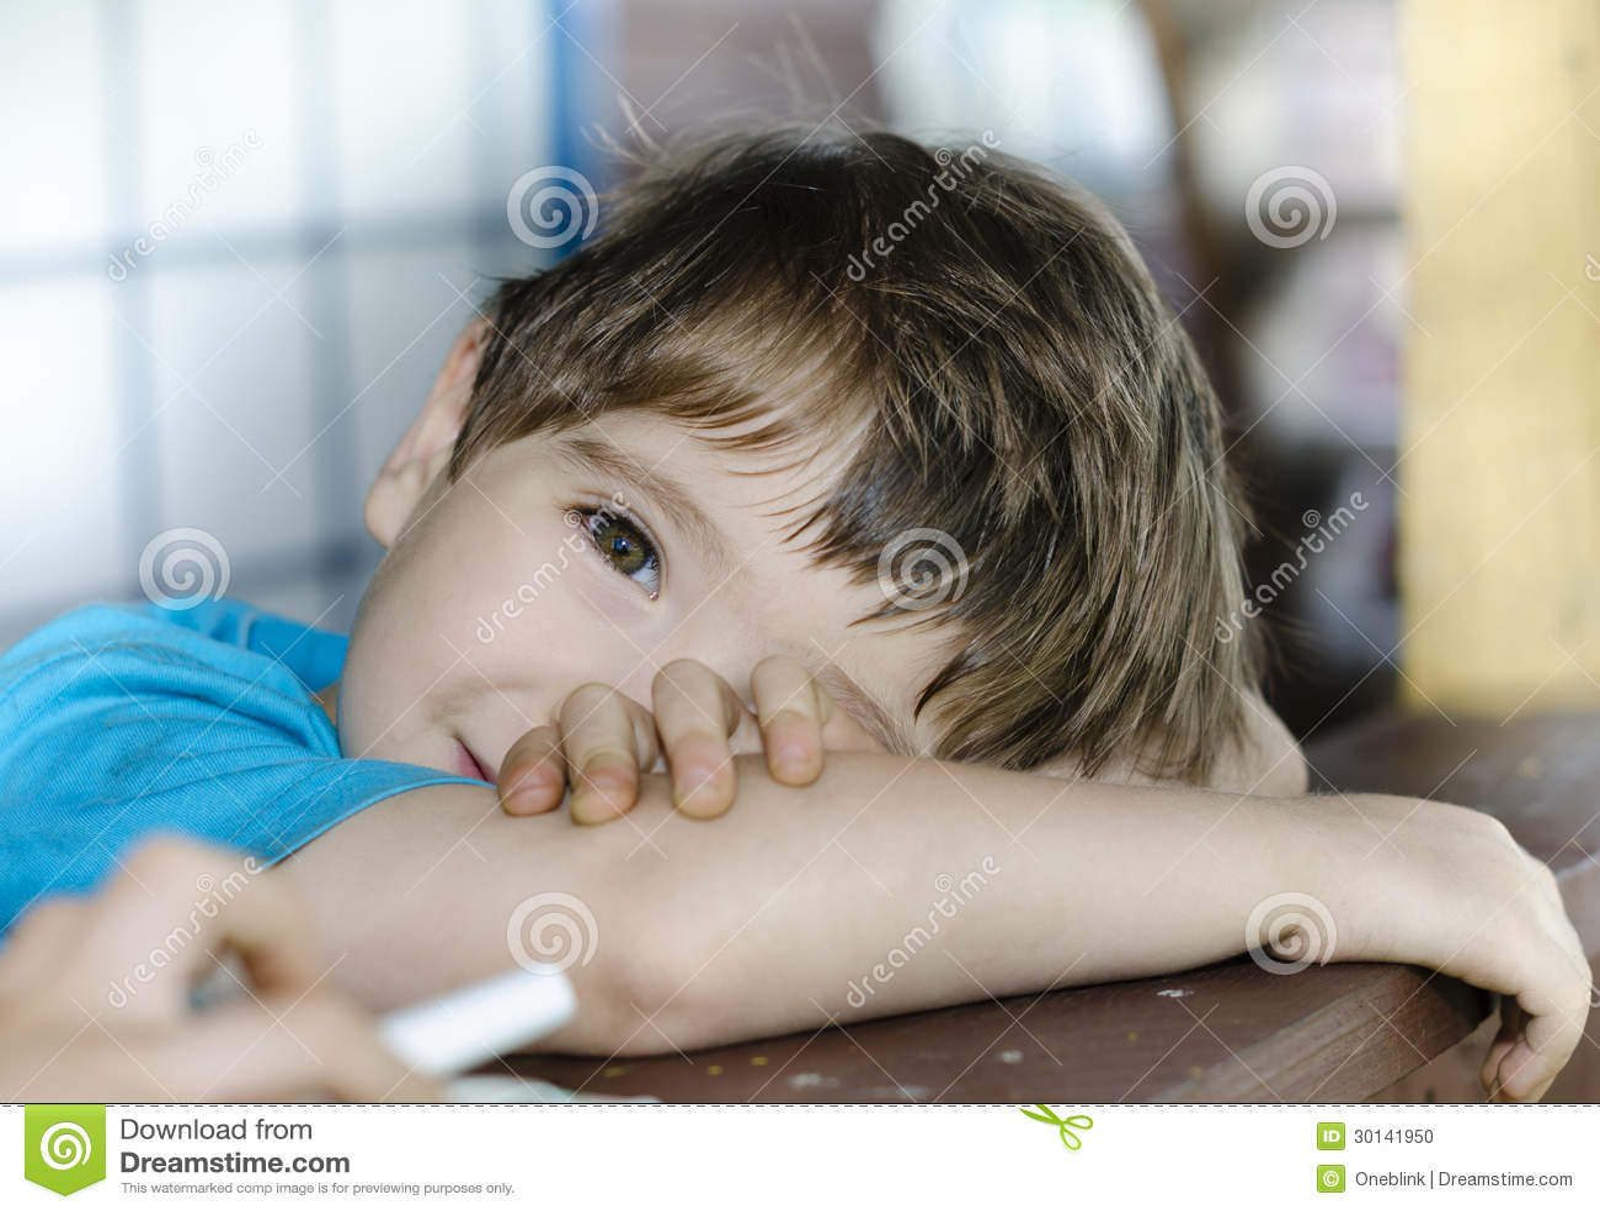 Child's Glance Stock Photo - Image: 30141950